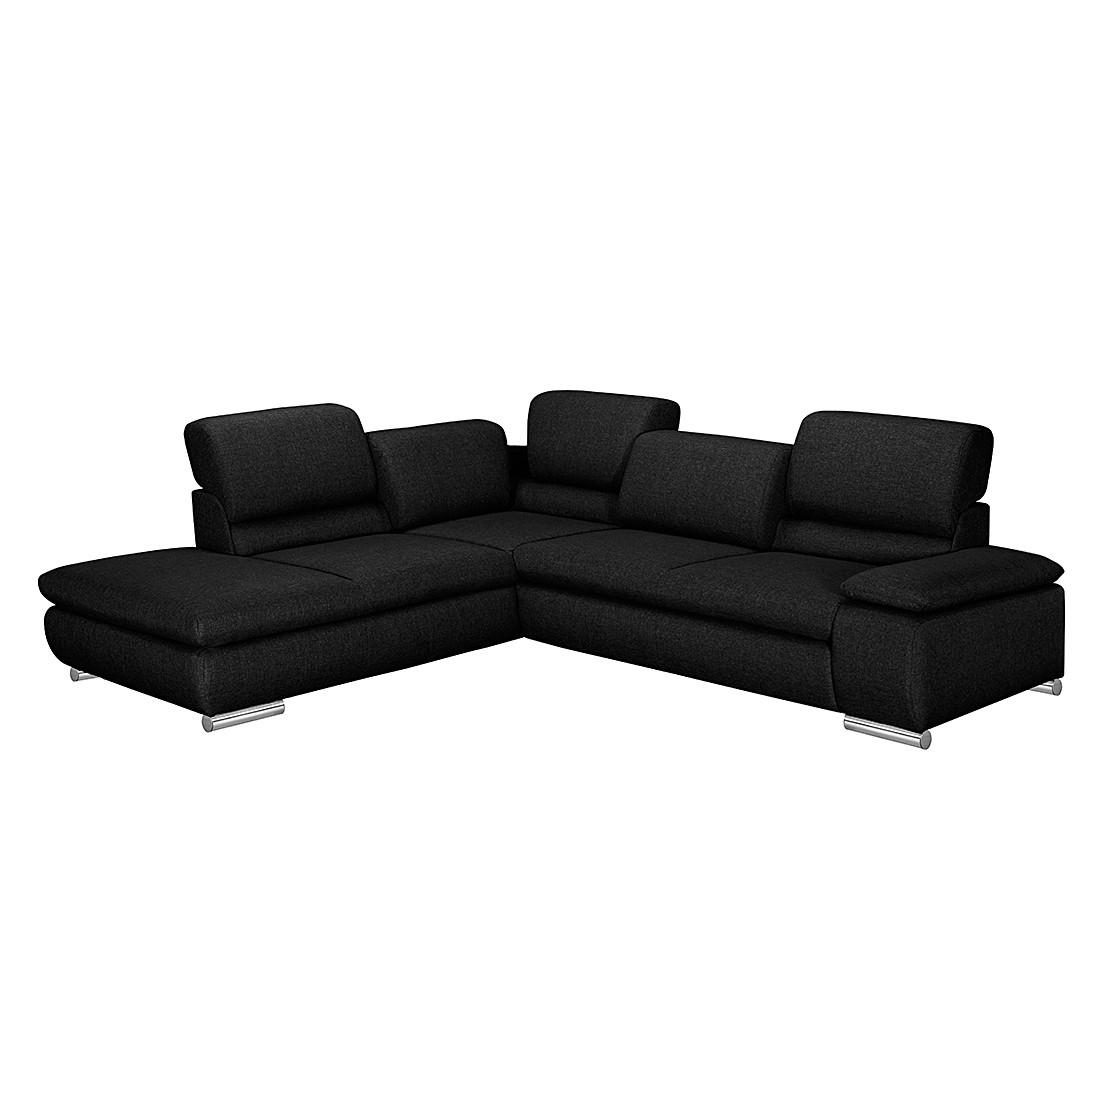 ecksofa masca strukturstoff beige ottomane davorstehend links mit schlaffunktion. Black Bedroom Furniture Sets. Home Design Ideas